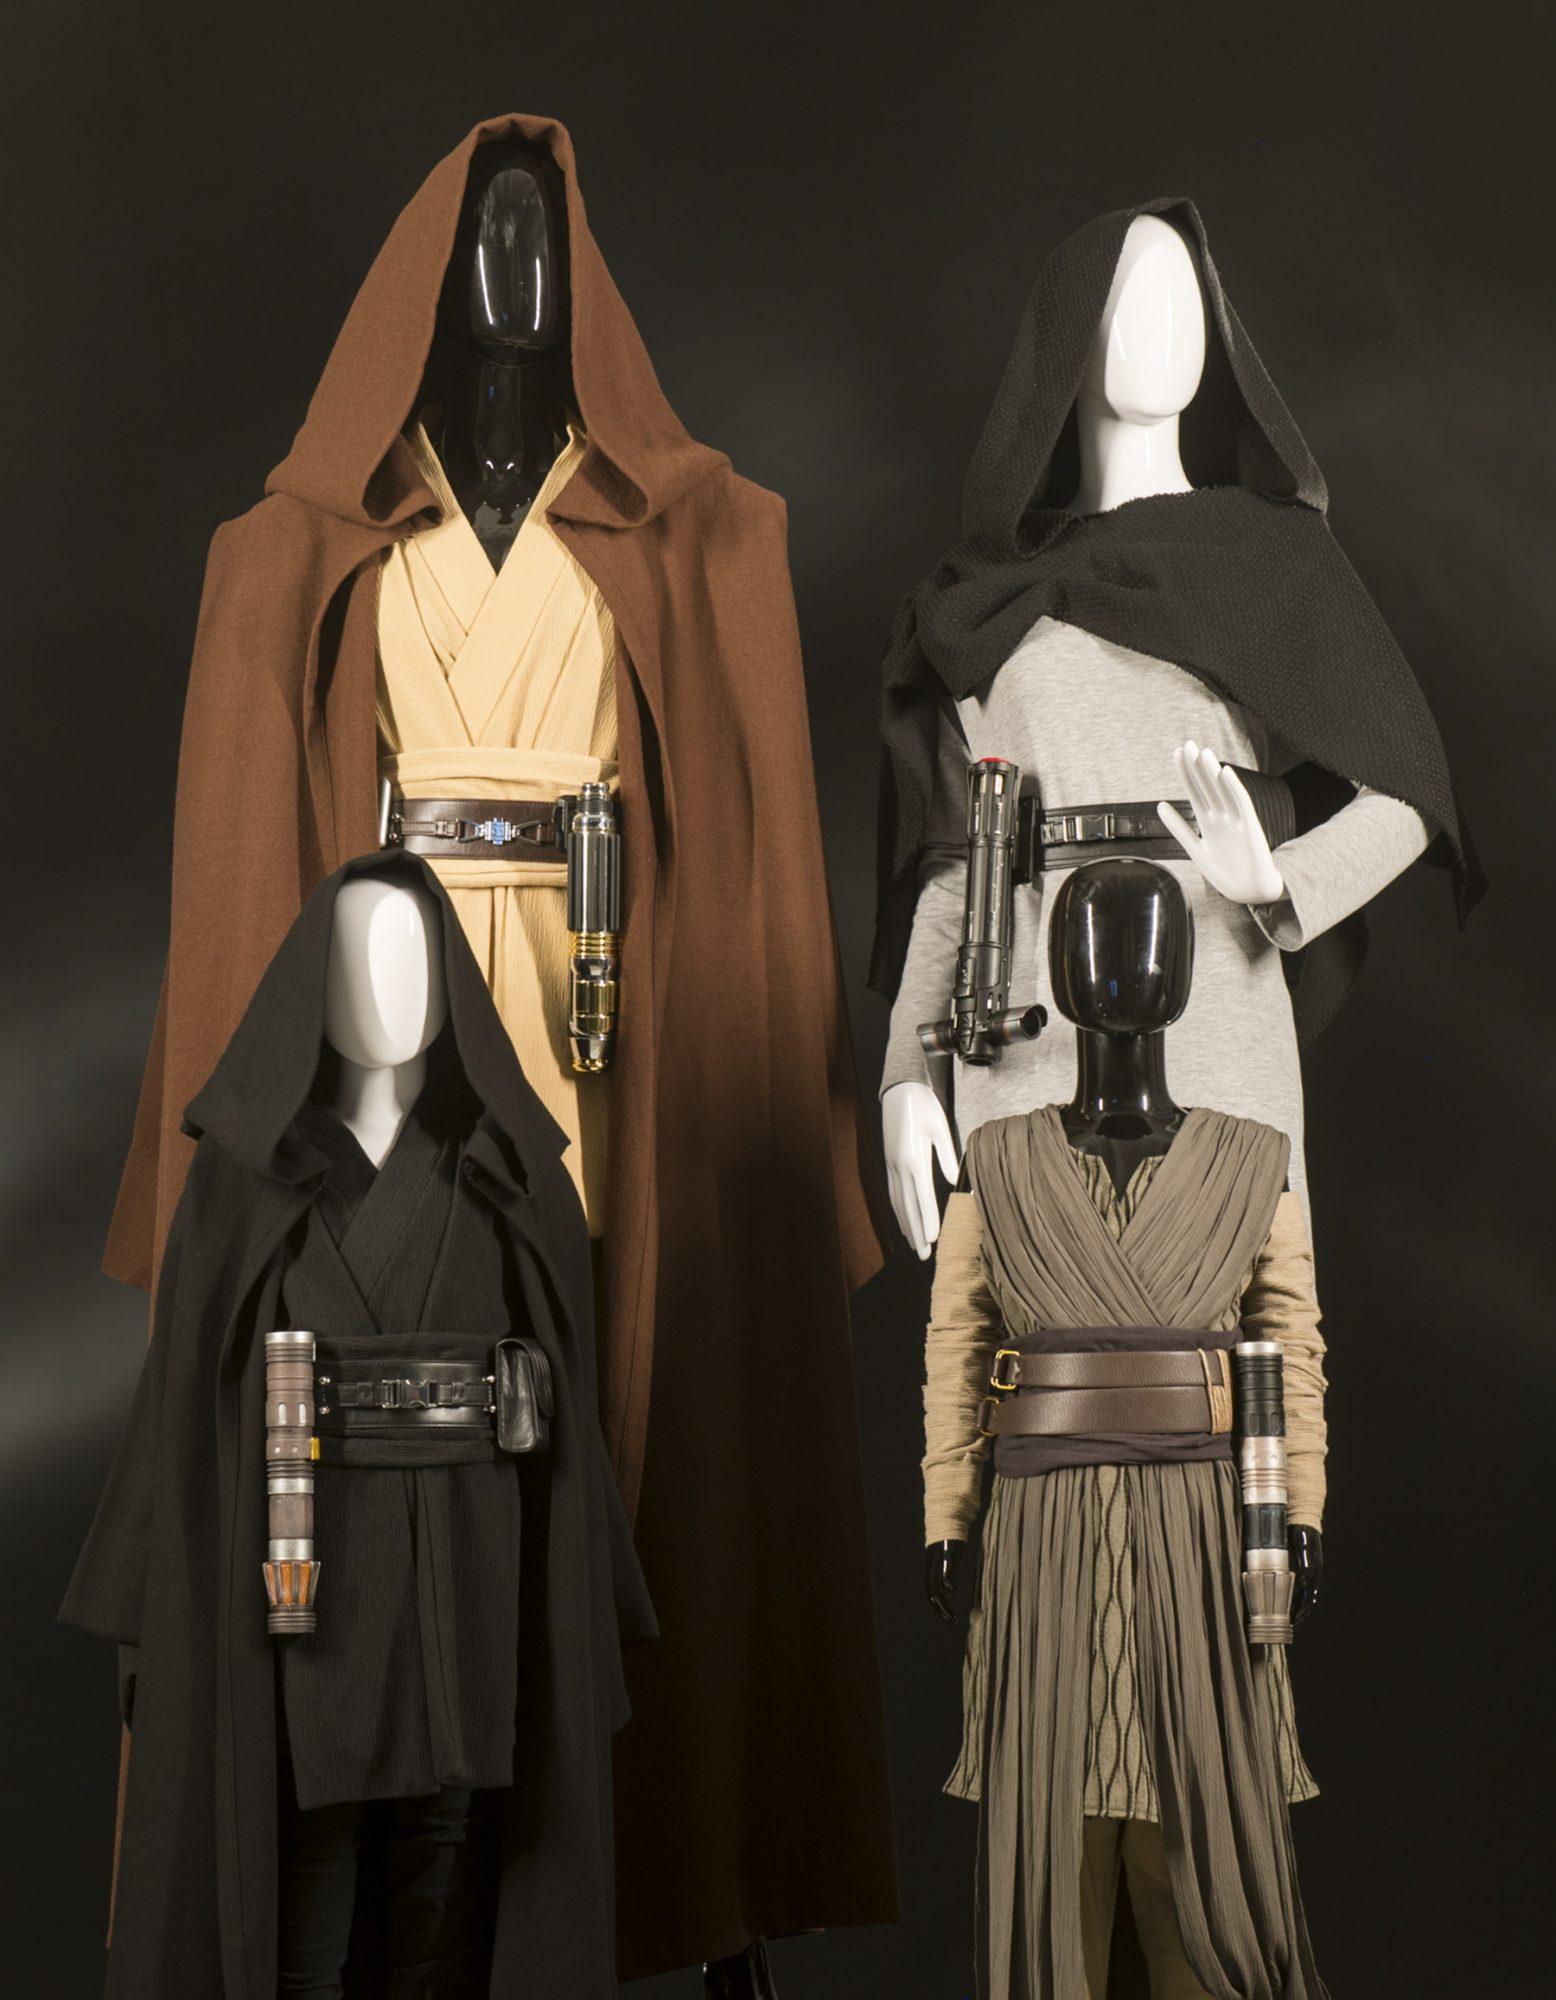 Star Wars: Galaxy's Edge Merchandise – Apparel